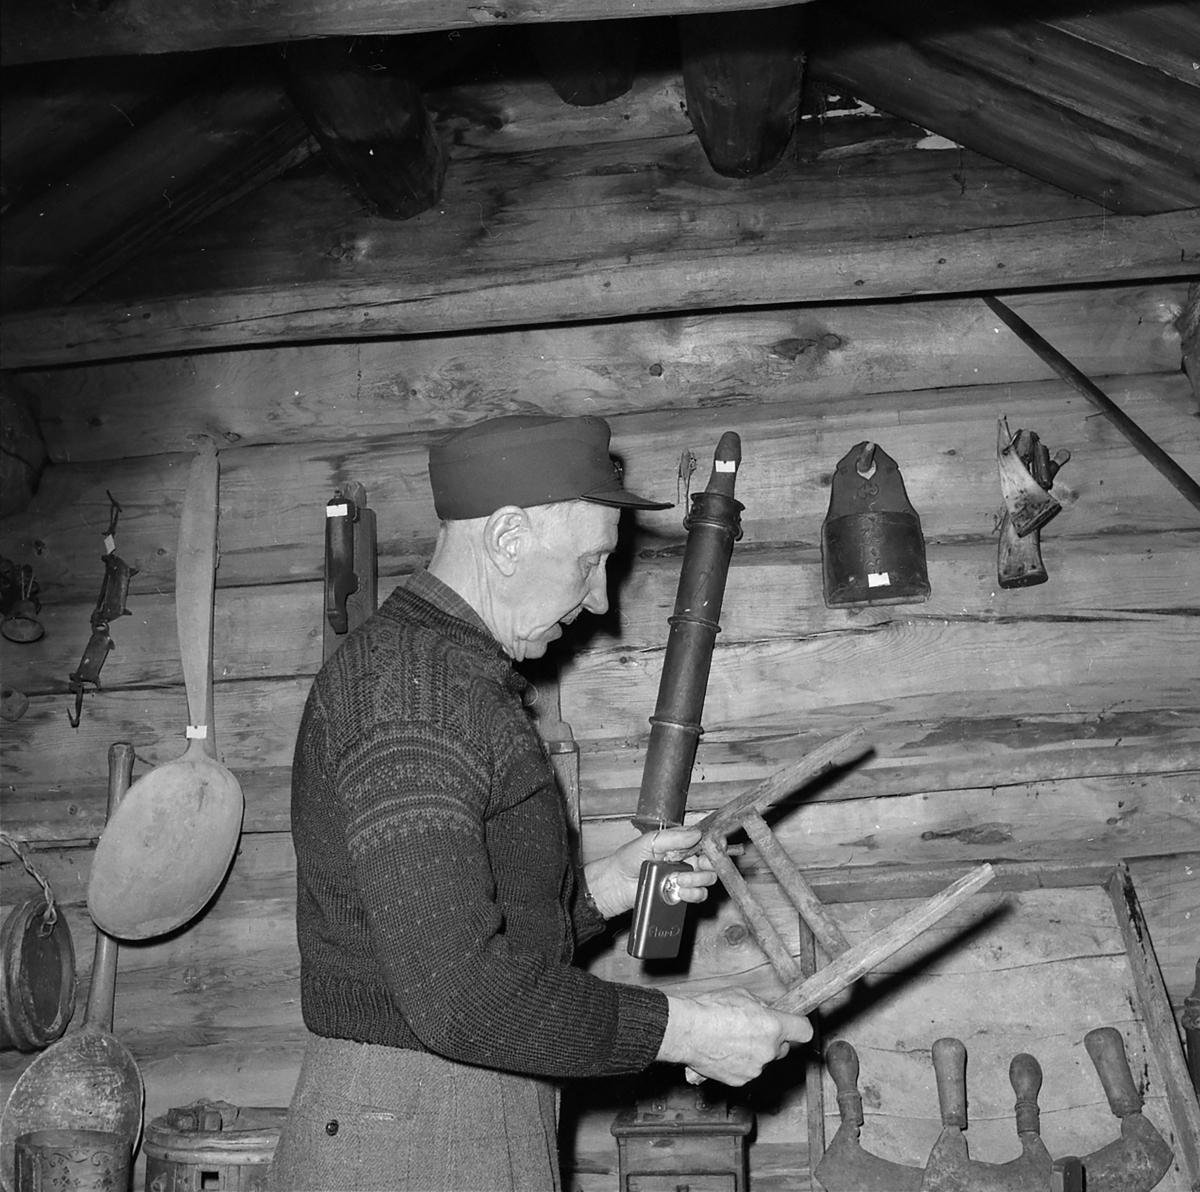 Iver Eide, fjellbonden og bygdehistorikeren fra Tolga med sin gårdssamling på stabbur